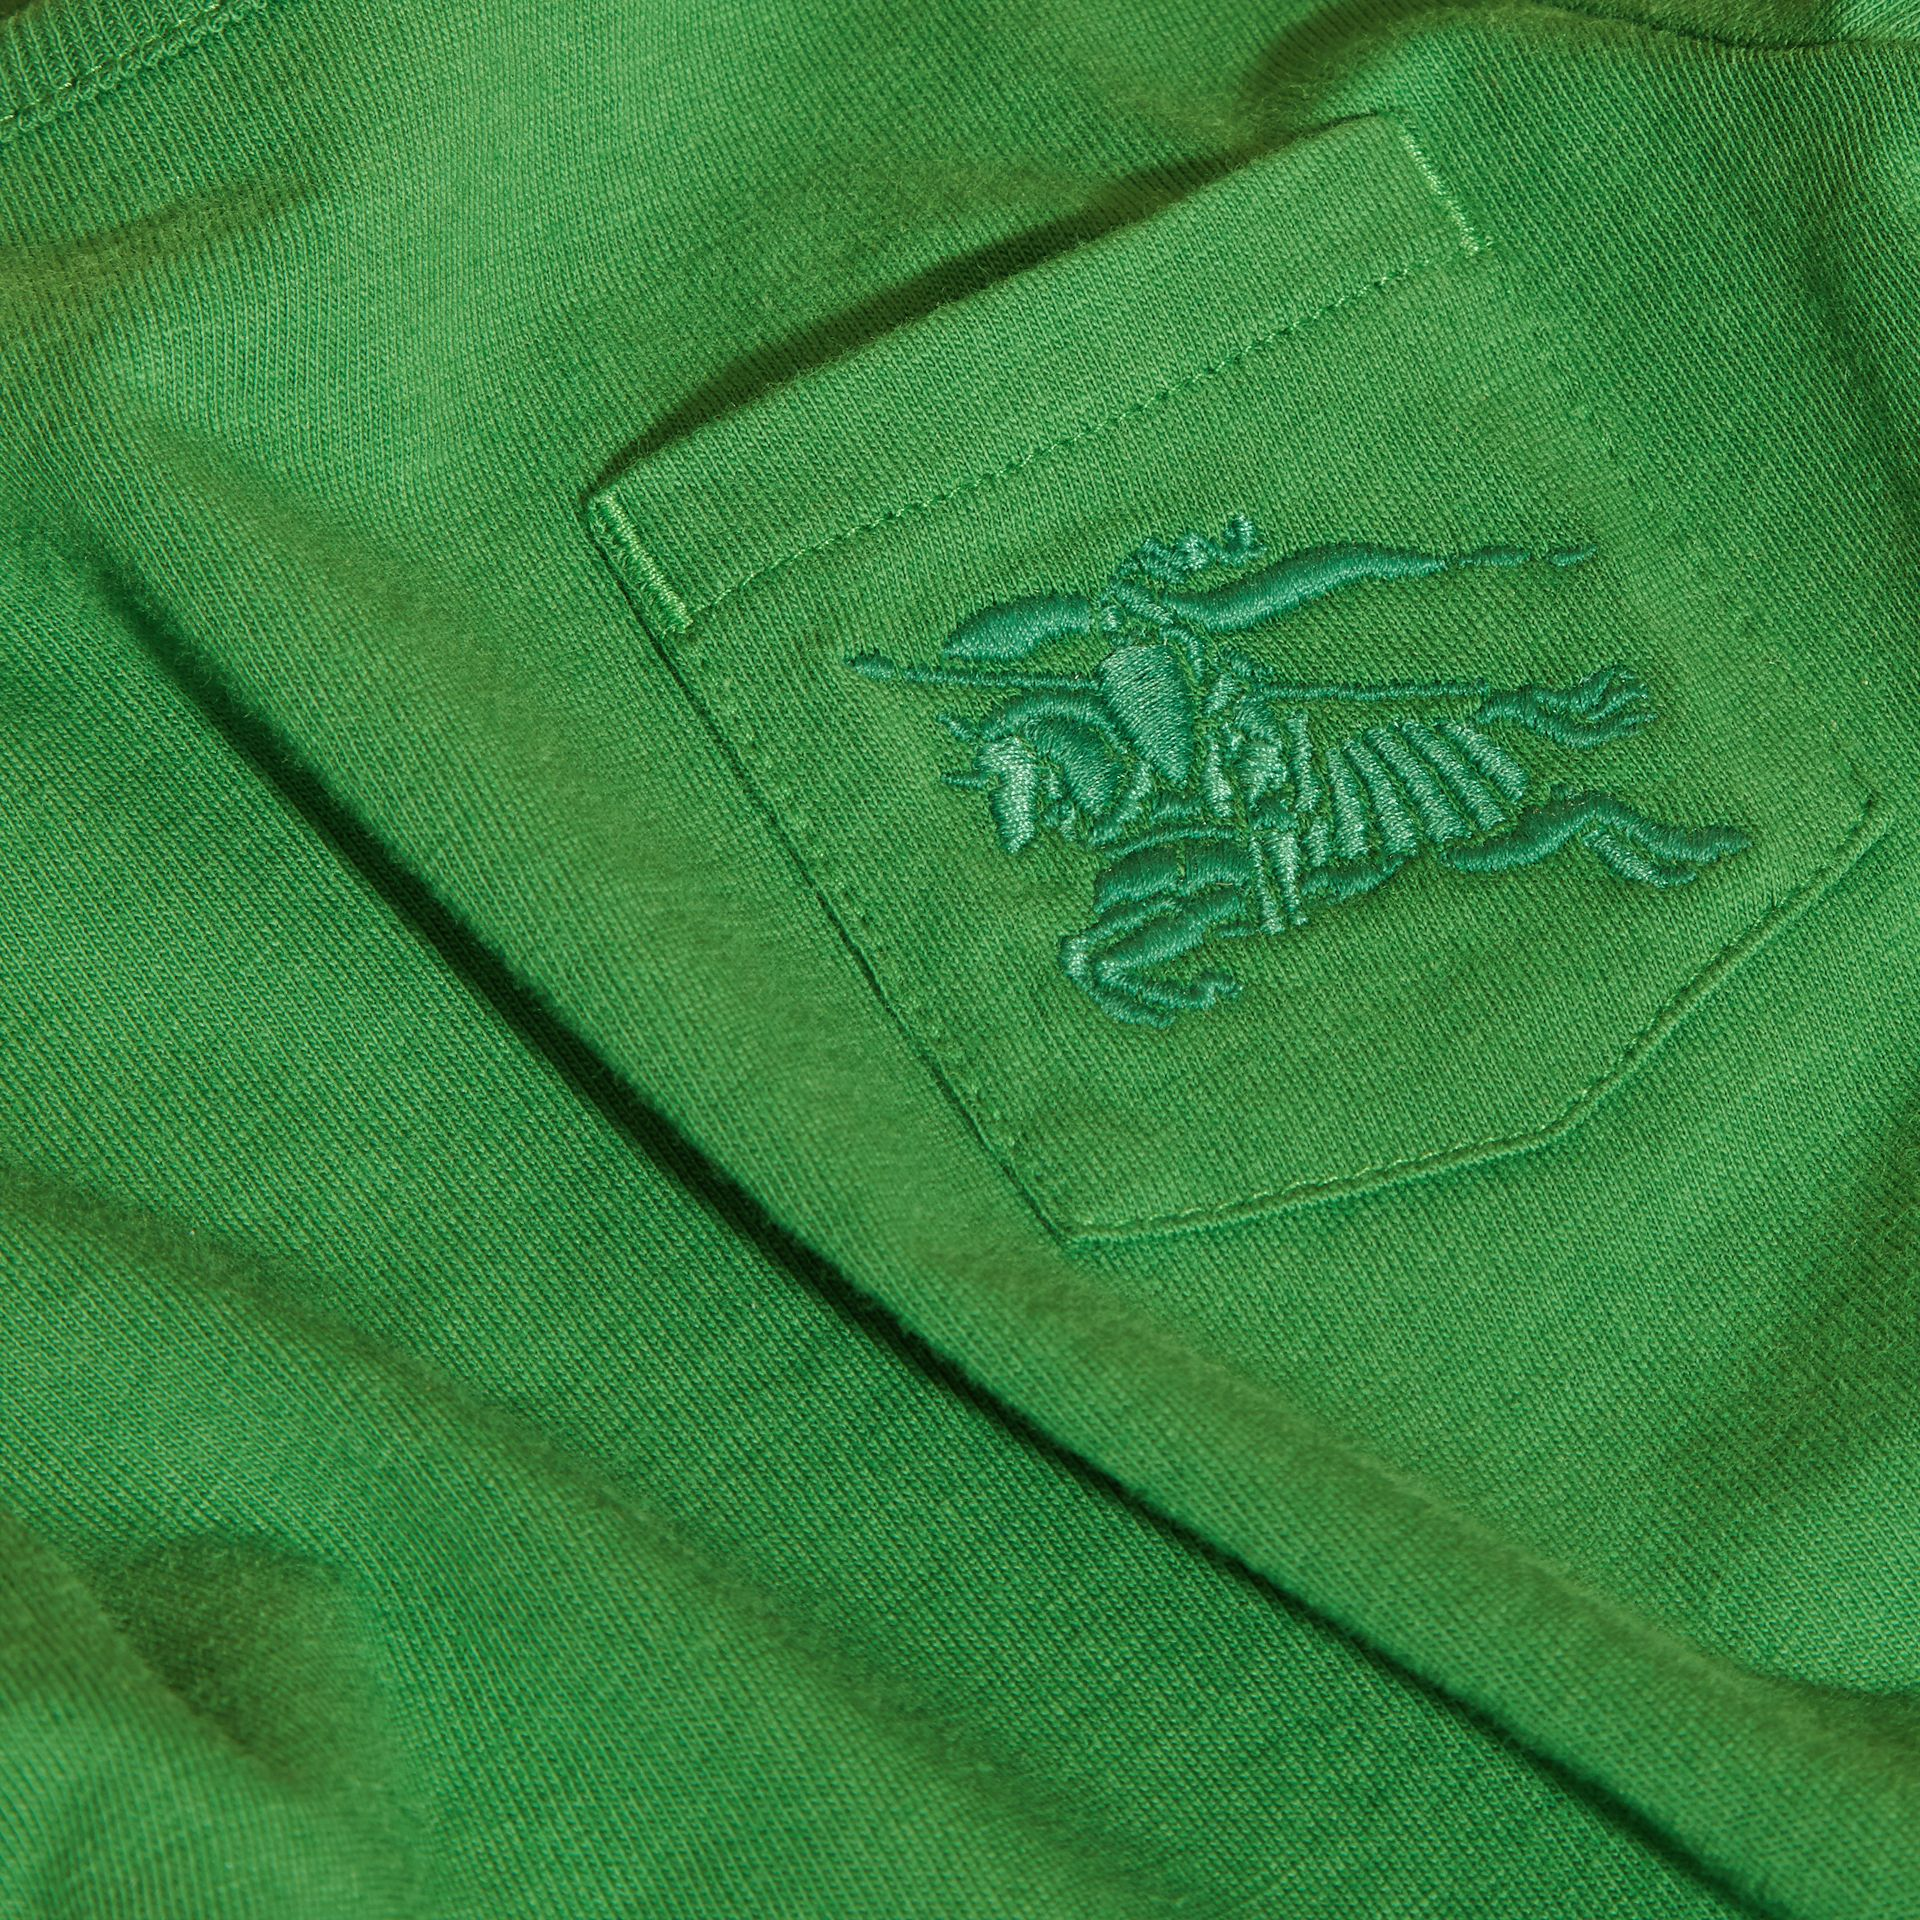 Verde felce brillante T-shirt girocollo in cotone Verde Felce Brillante - immagine della galleria 2